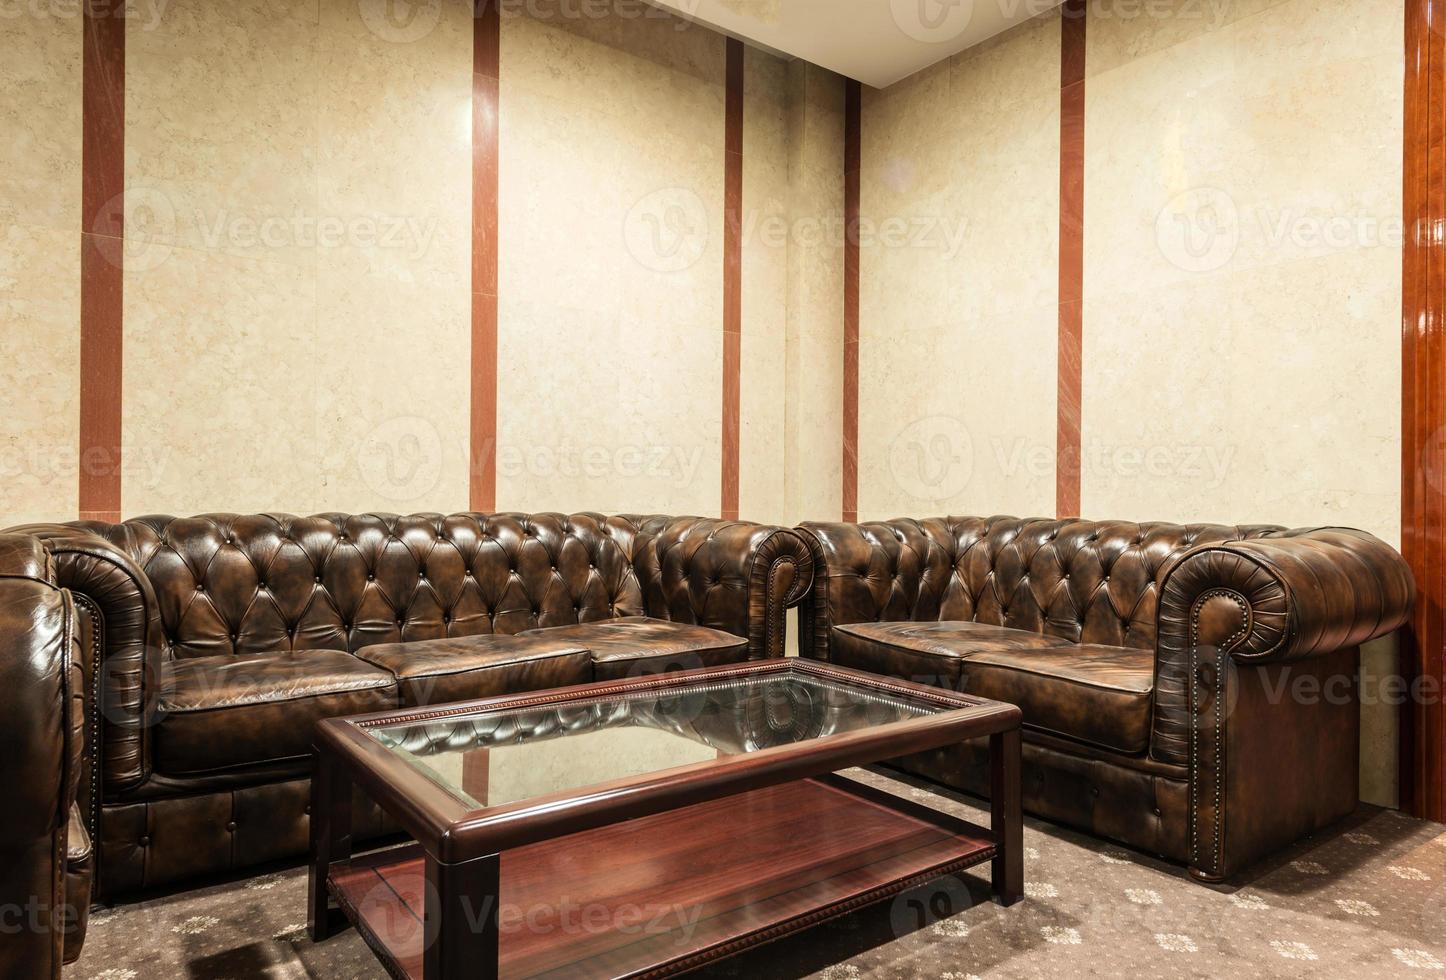 Luxus-Lobby im Hotel foto